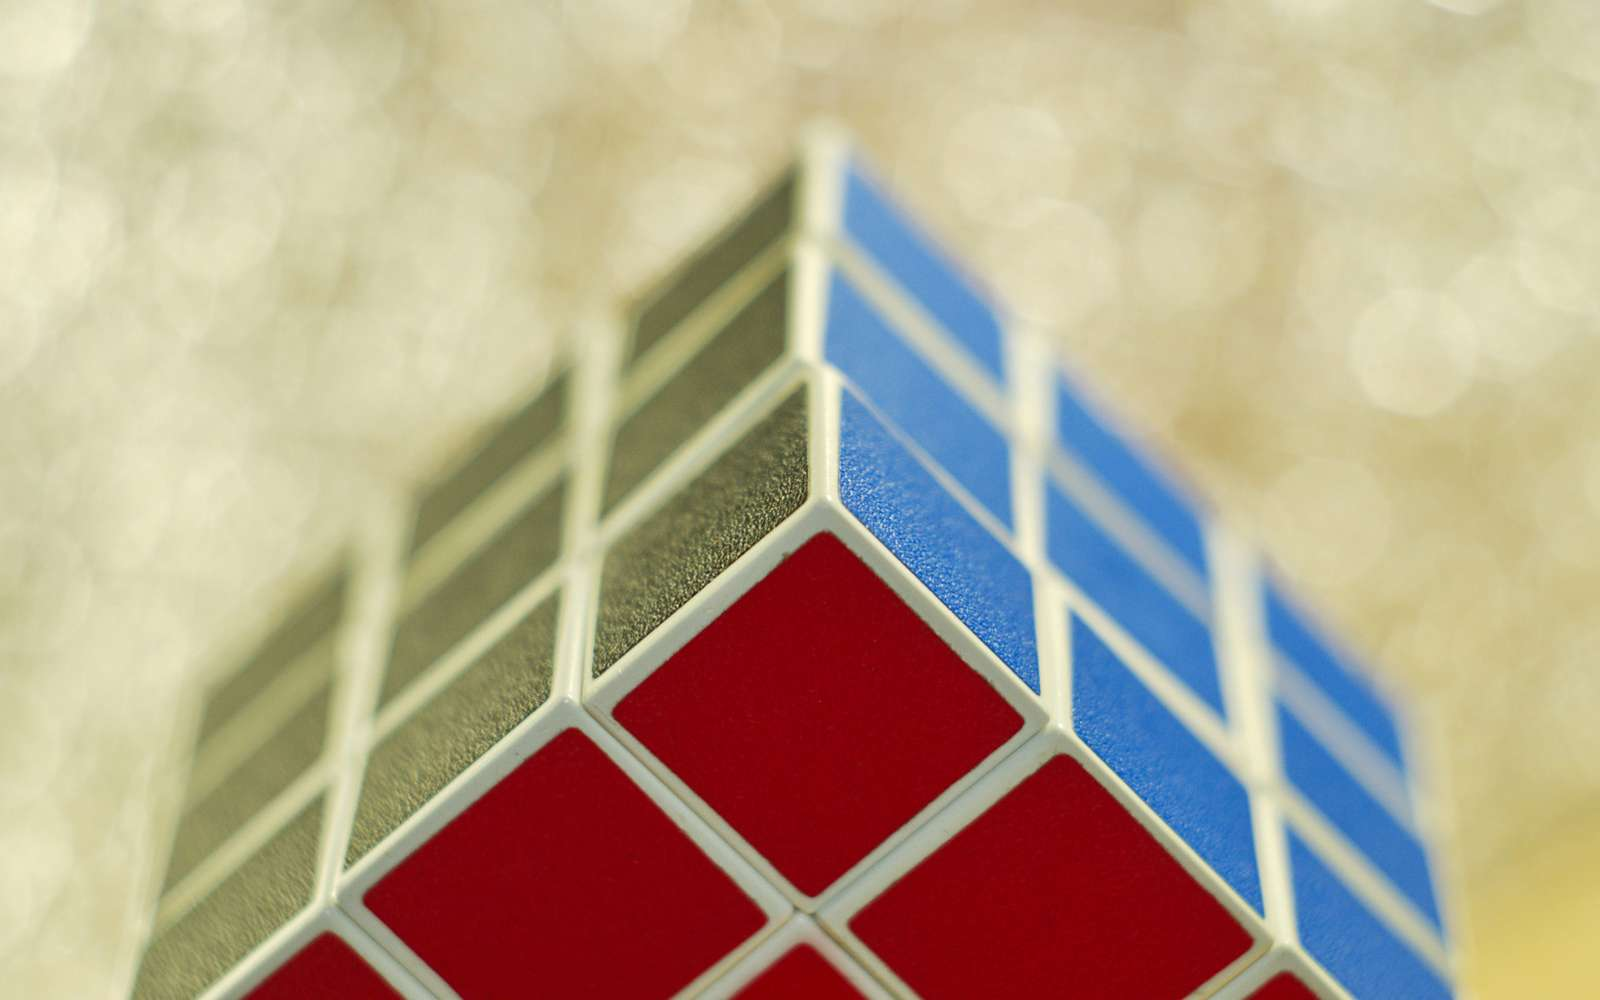 Le Rubik's Cube. © Александр Ткаченко, Fotolia